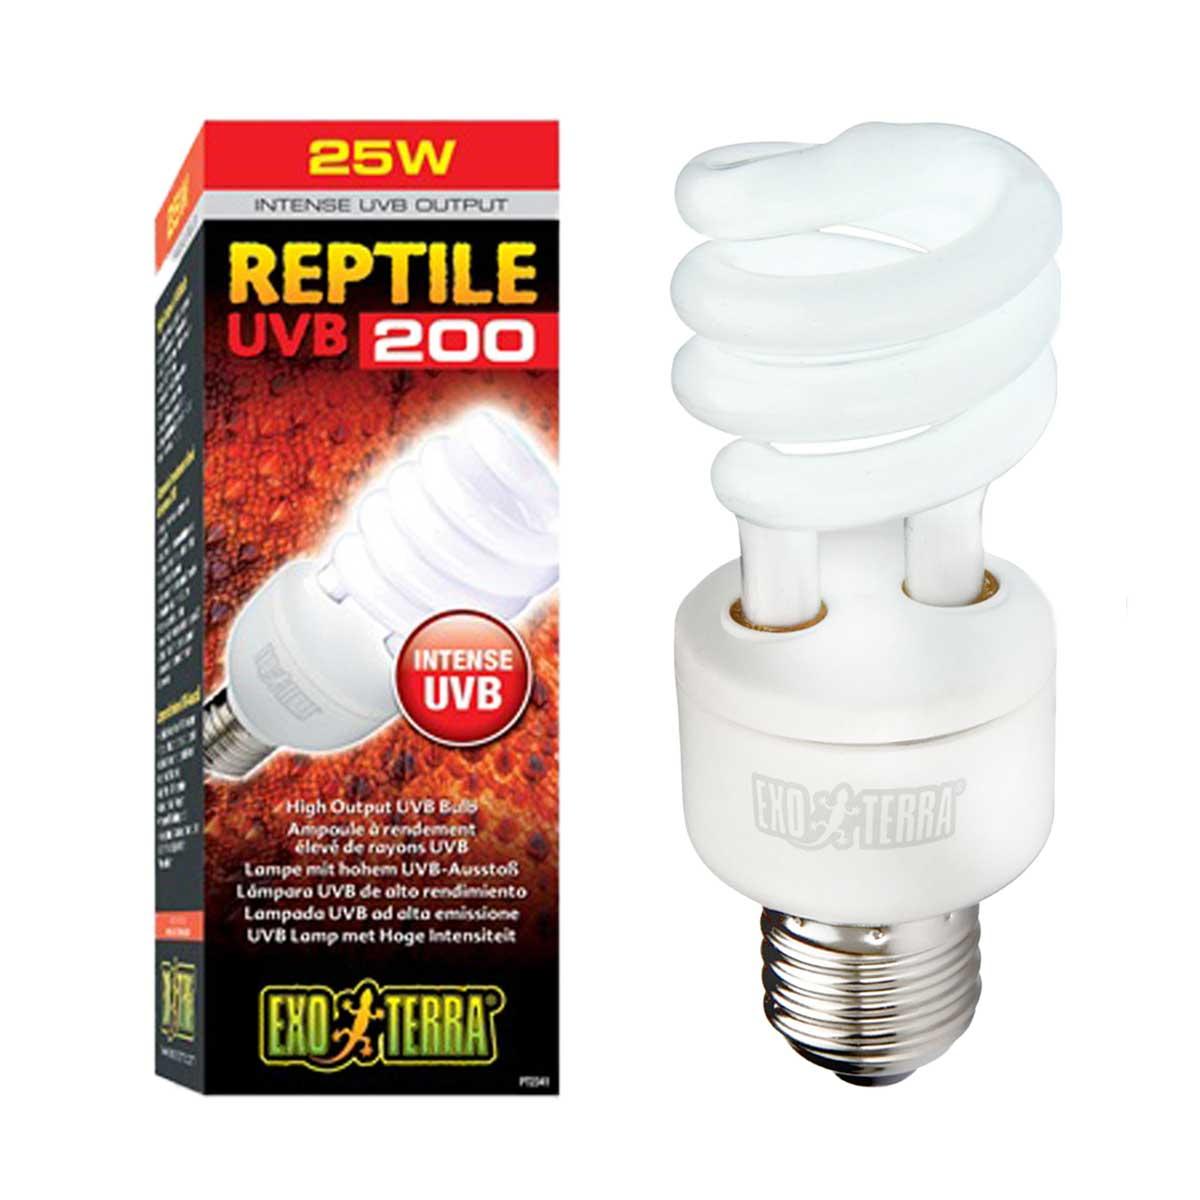 Exo Terra Reptile UVB200 Compact UV Bulb - 25 Watts - Serpentia